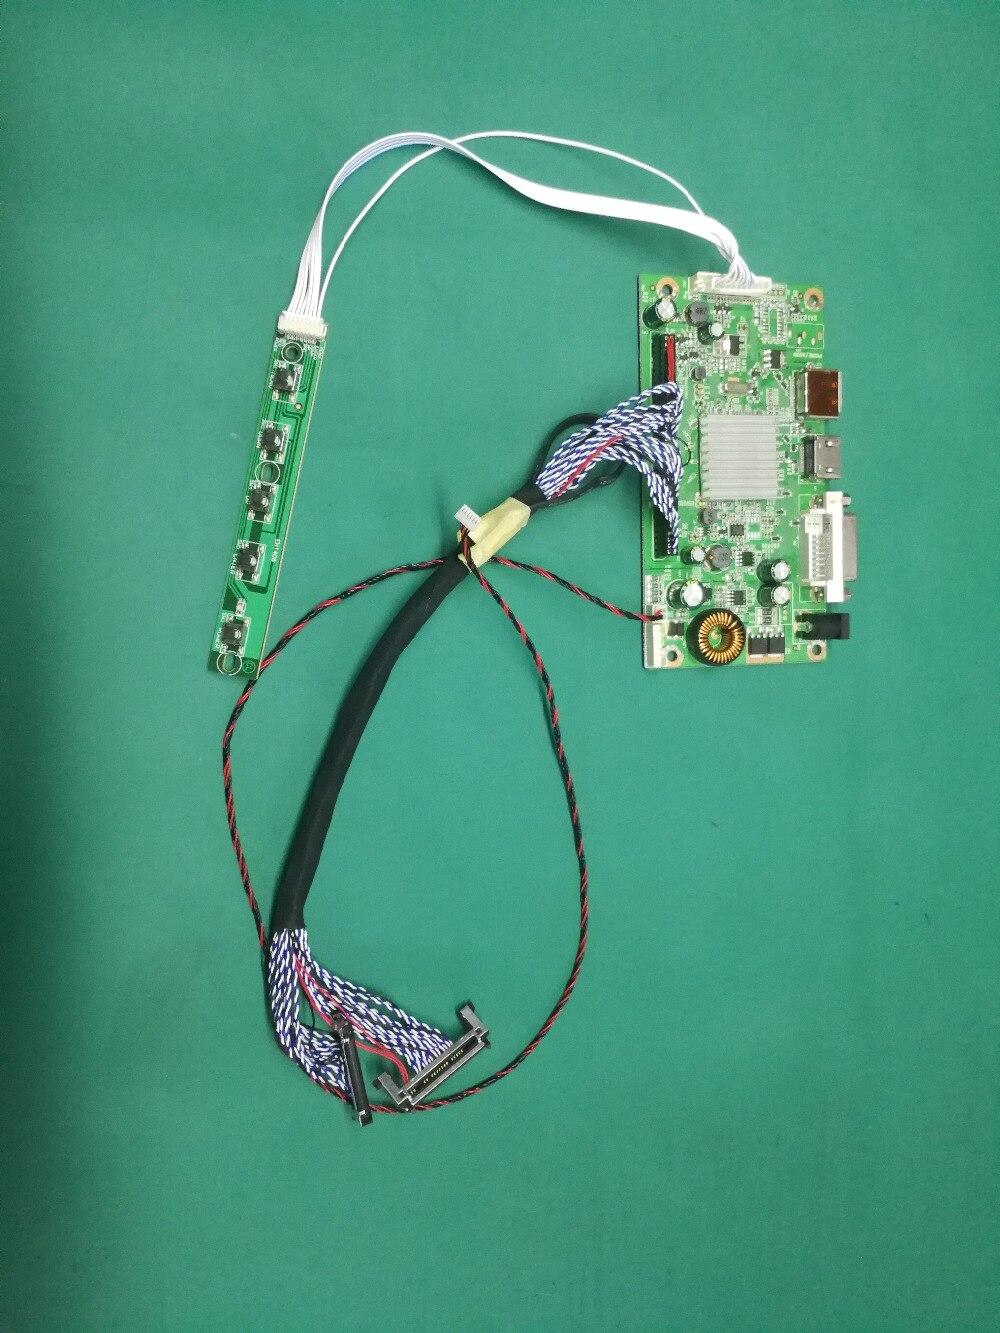 Kit de Monitor de placa controladora LCD 2K para LM265SQ1 LM290WW1 LM250WW1 LM270WQ4 M270KCJ-L5B LM340WW1 pantalla LCD panel